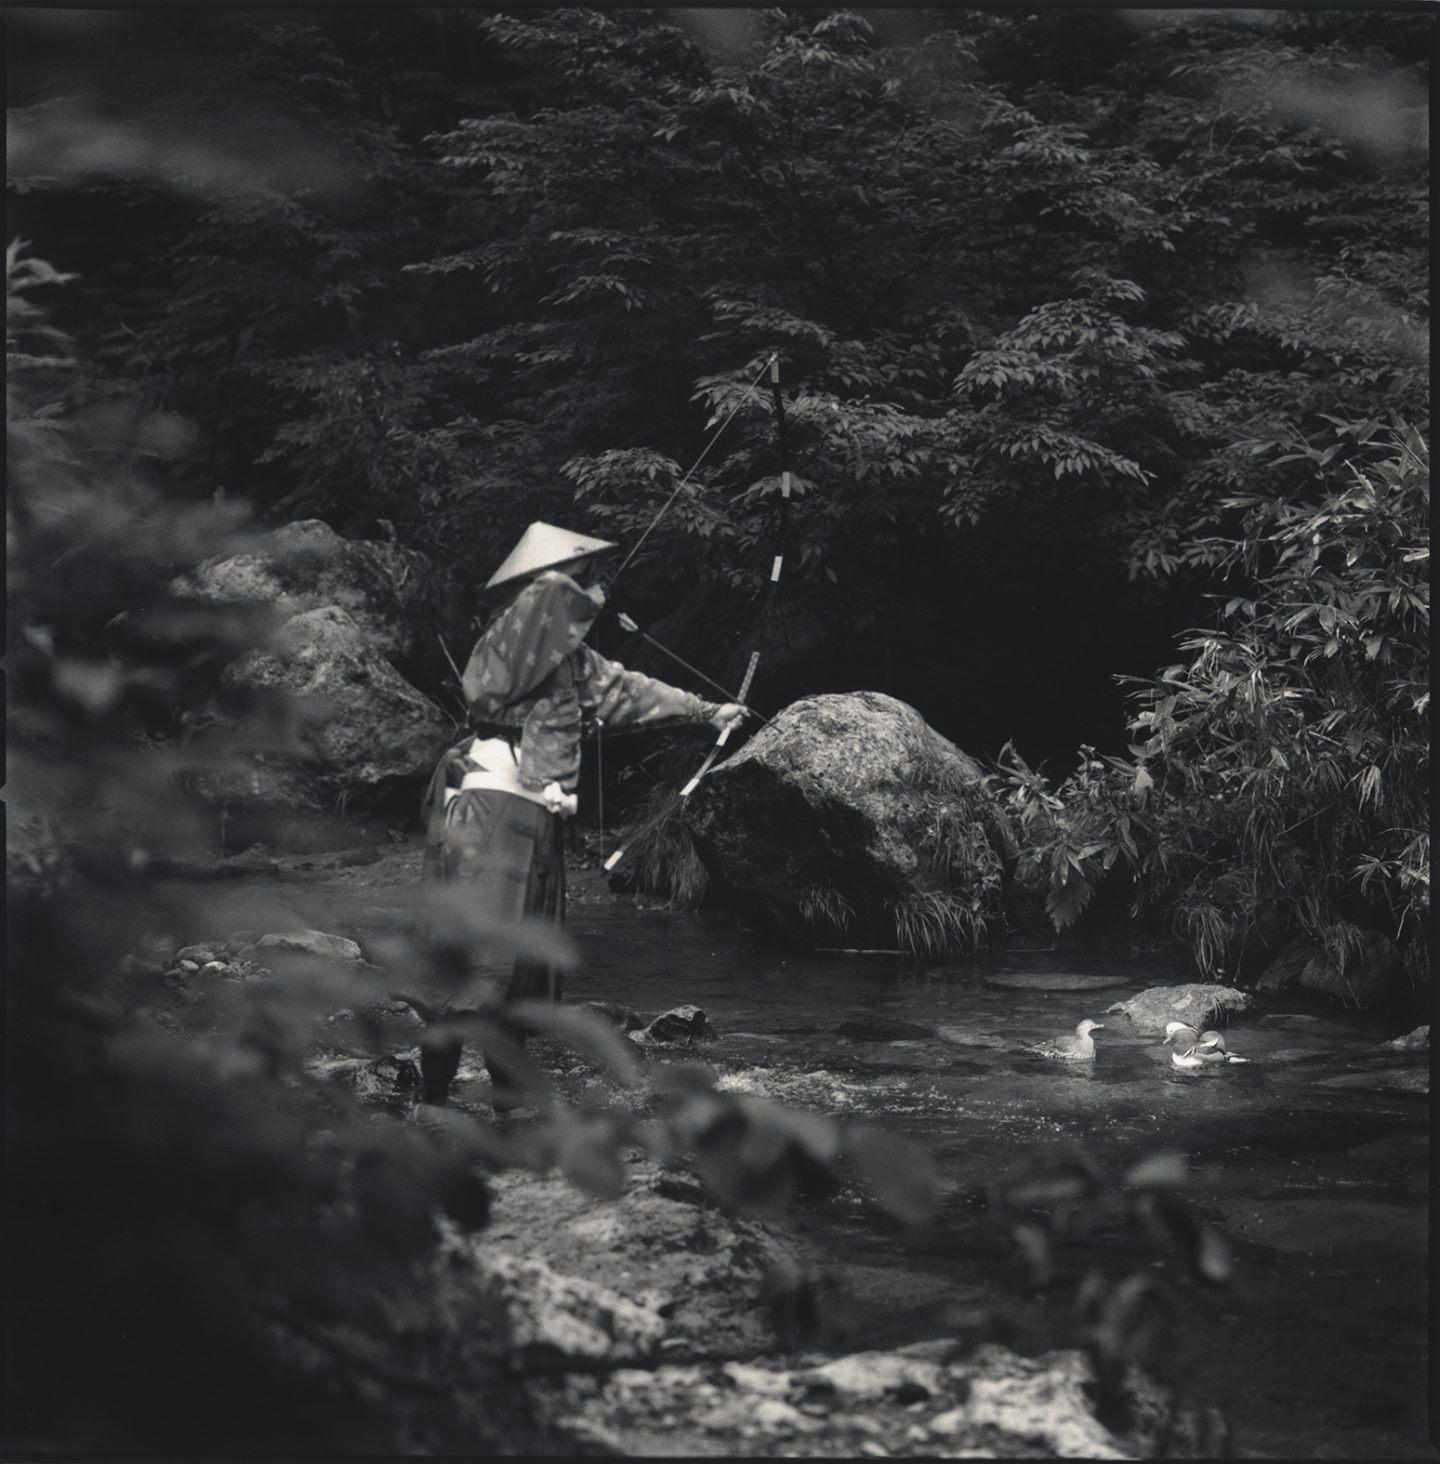 IGNANT-Photography-Hiroshi-Watanabe-Kwaidan-09